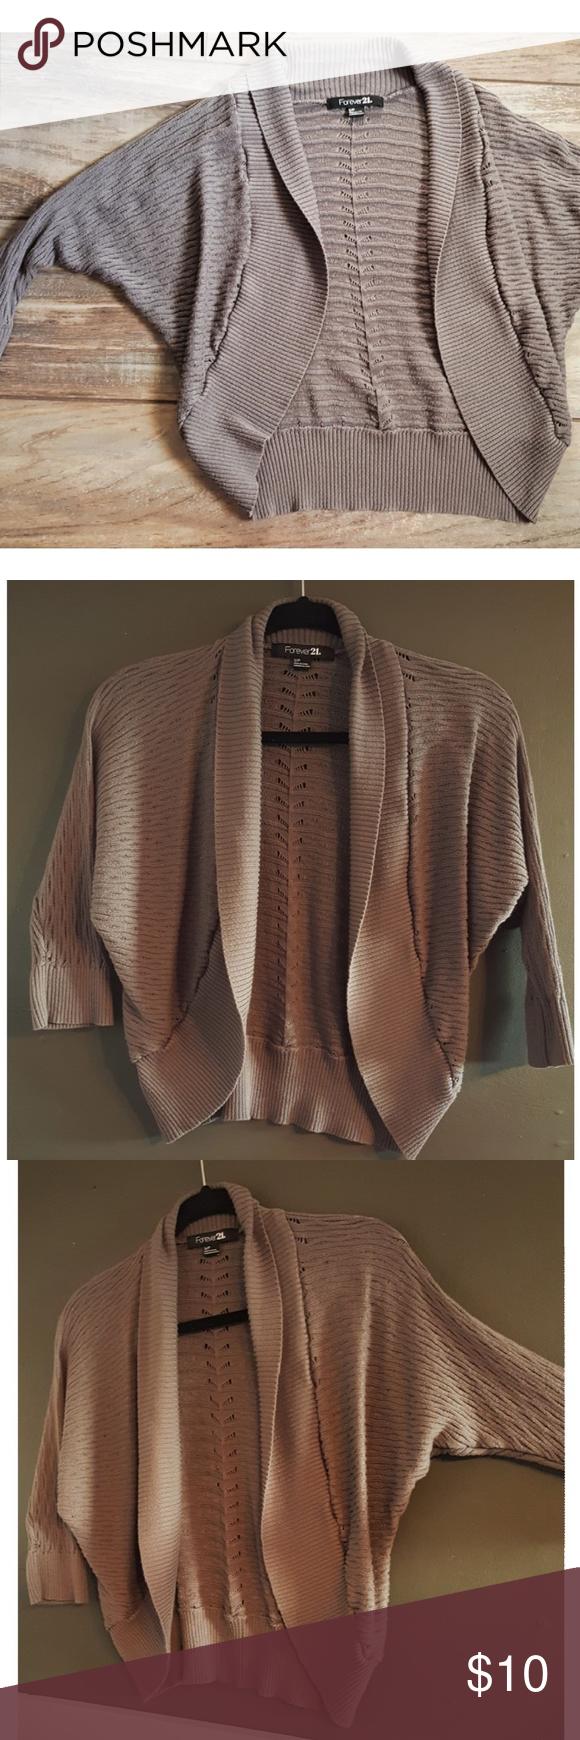 Forever 21 Gray Shrug Sweater Cardigan | Boleros, Grey shrug and 21st